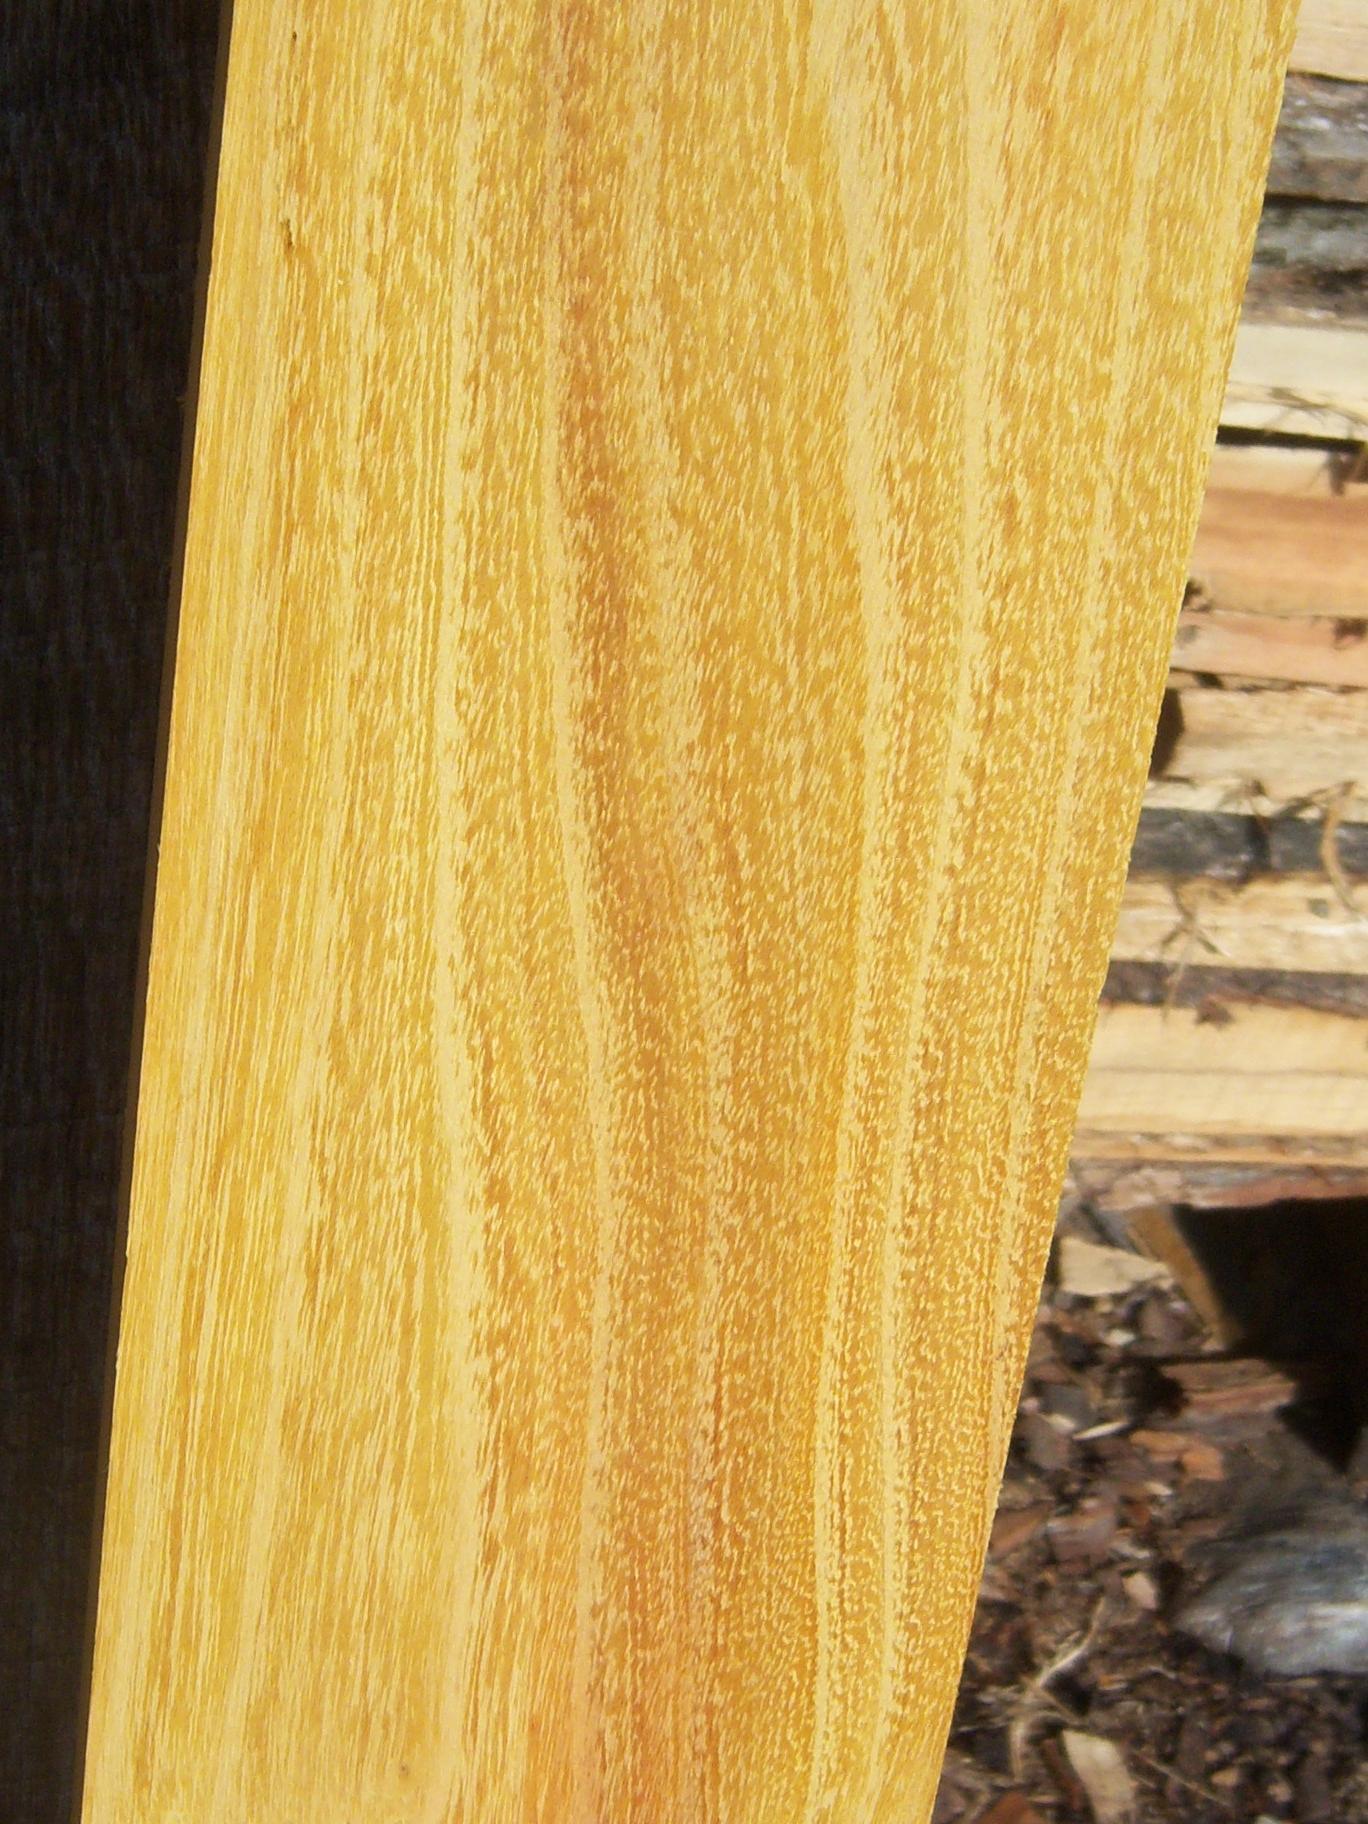 R M Smith Lumber